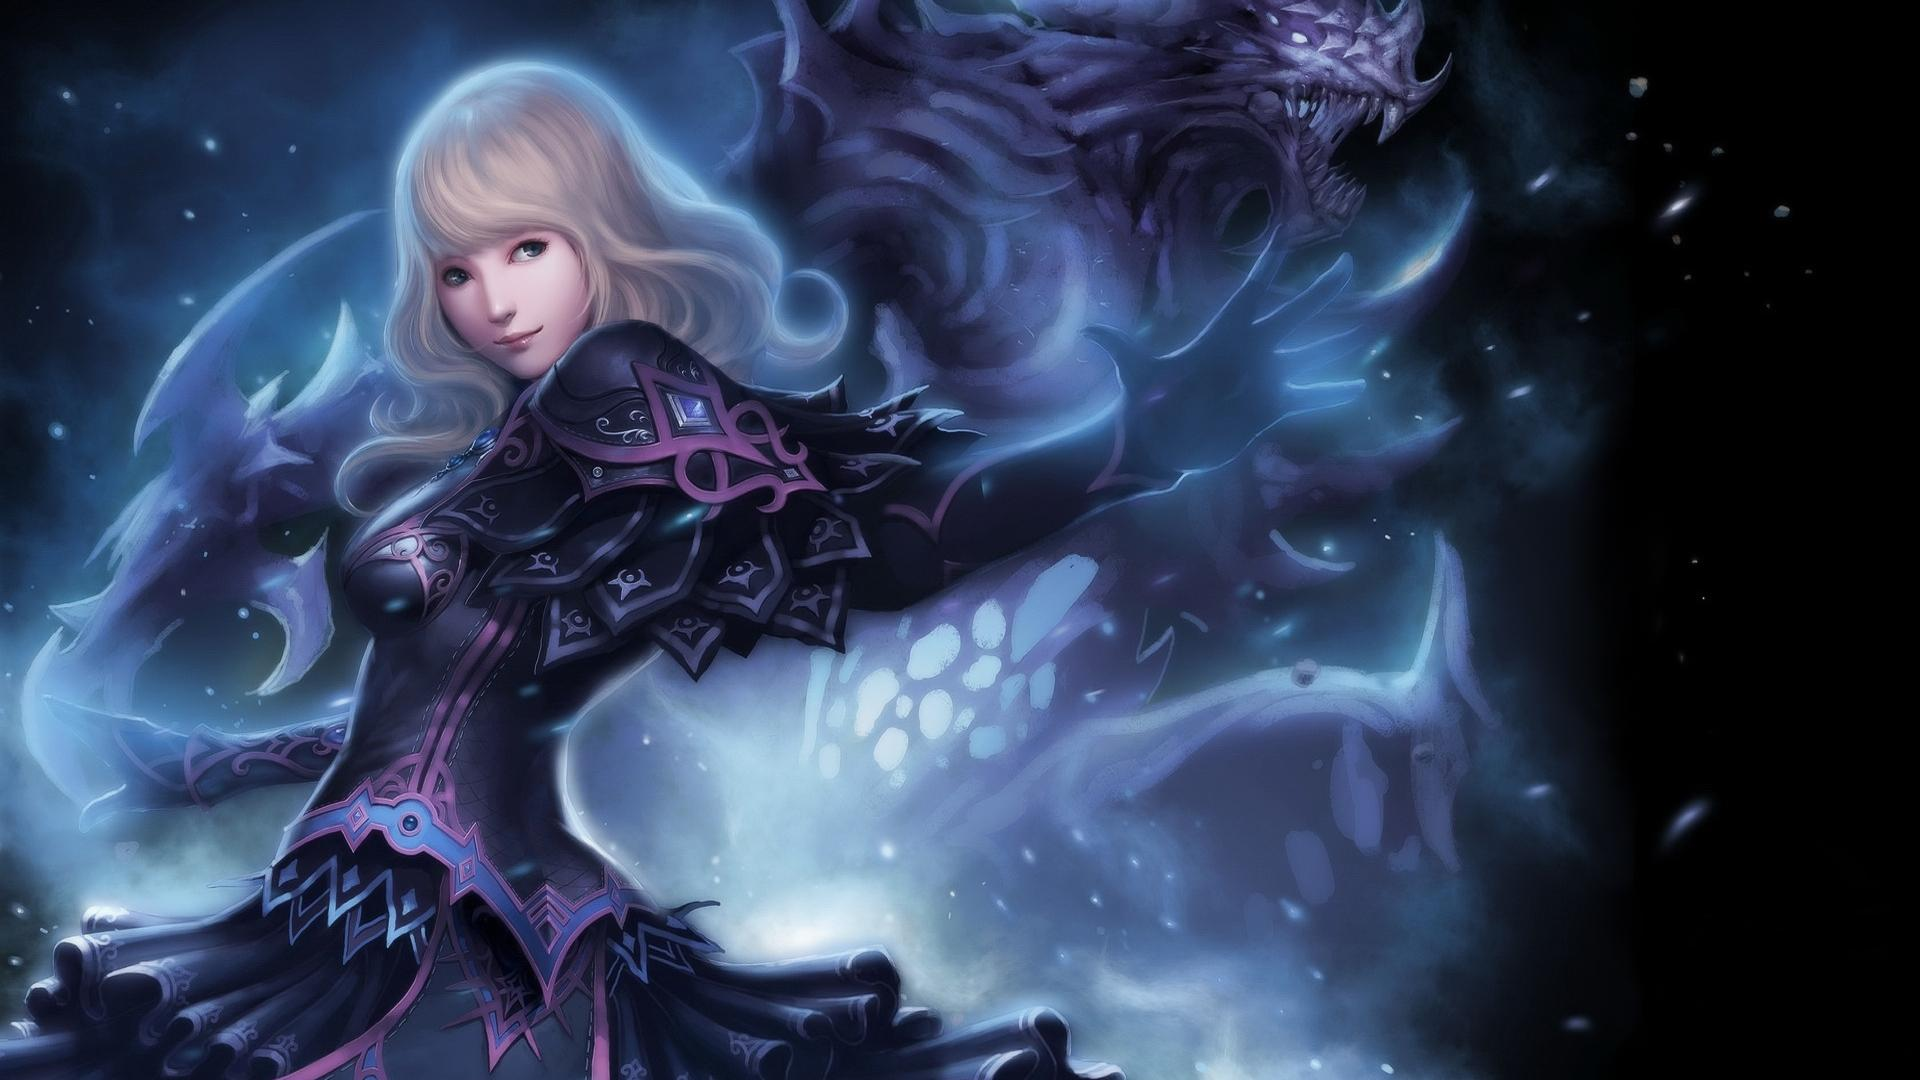 HD Drawing Blonde Warrior Anime Girls Monster Magic Wide